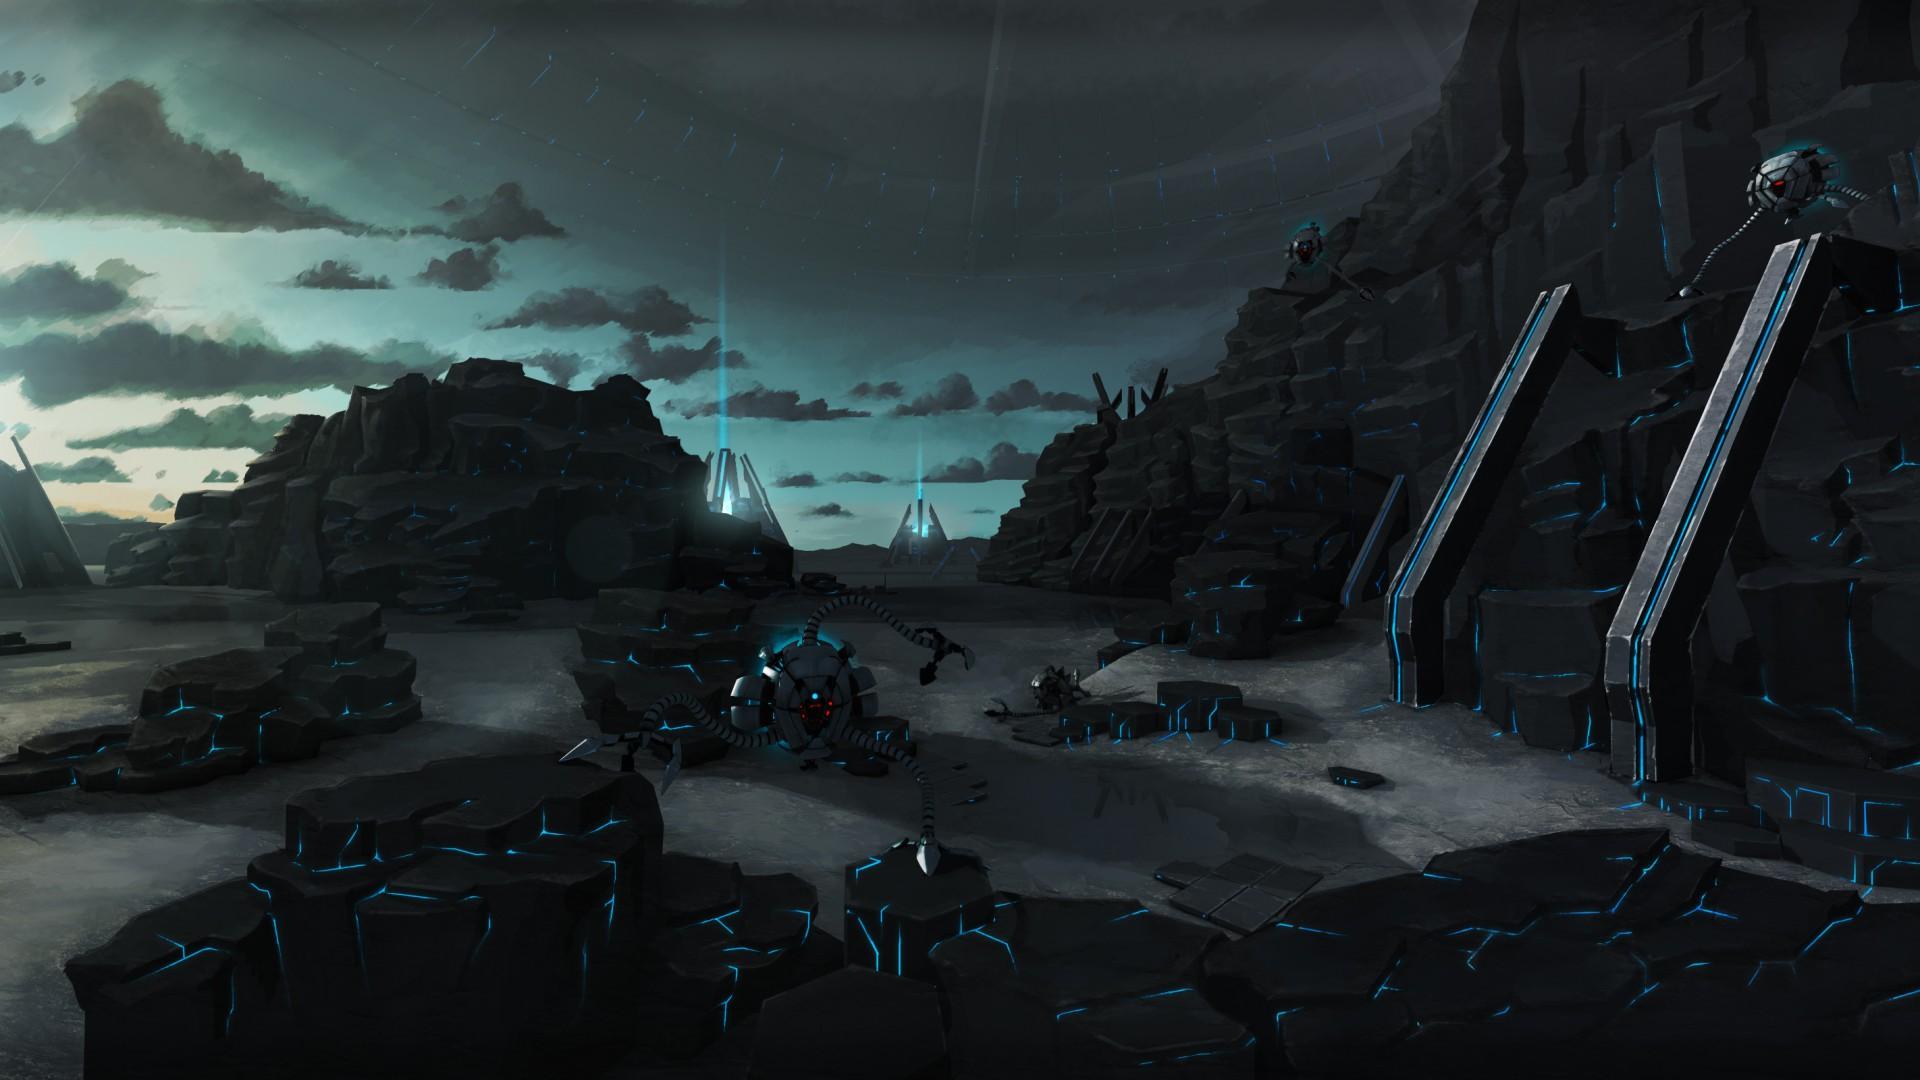 Wallpaper Eden Star Best Games 2015 Game Sci Fi Space Open World Games 4176